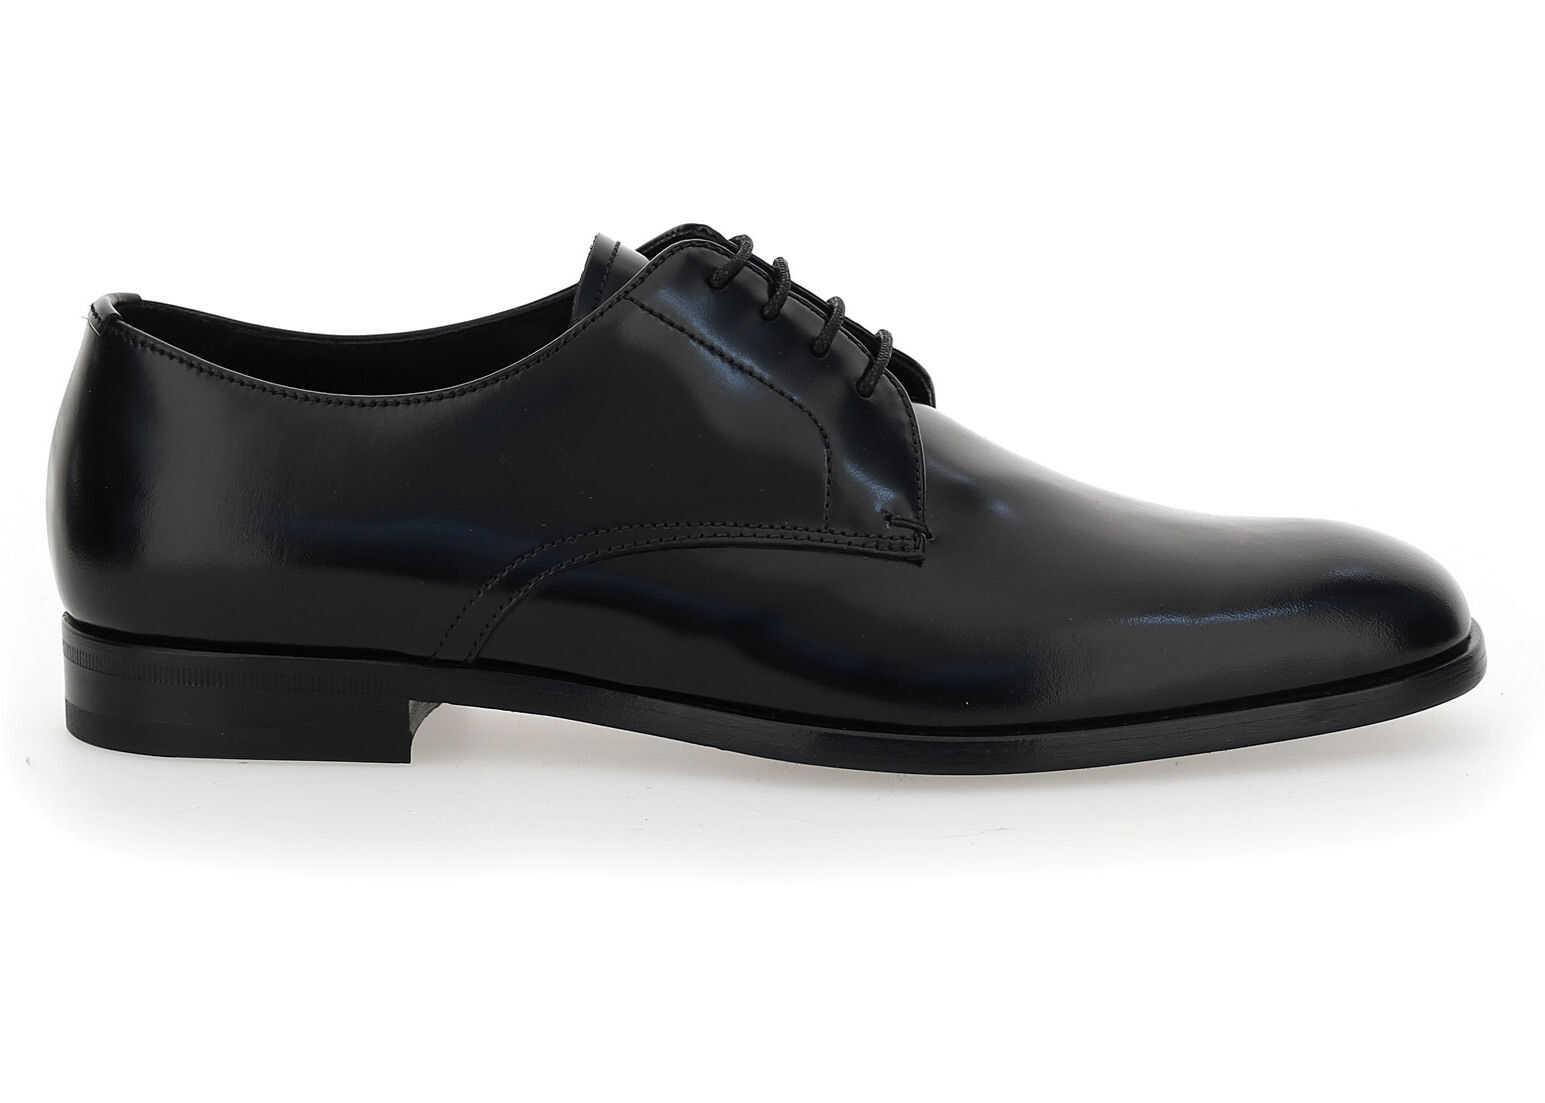 Prada Lace Up Shoes 2EB174FX001P39 NERO imagine b-mall.ro